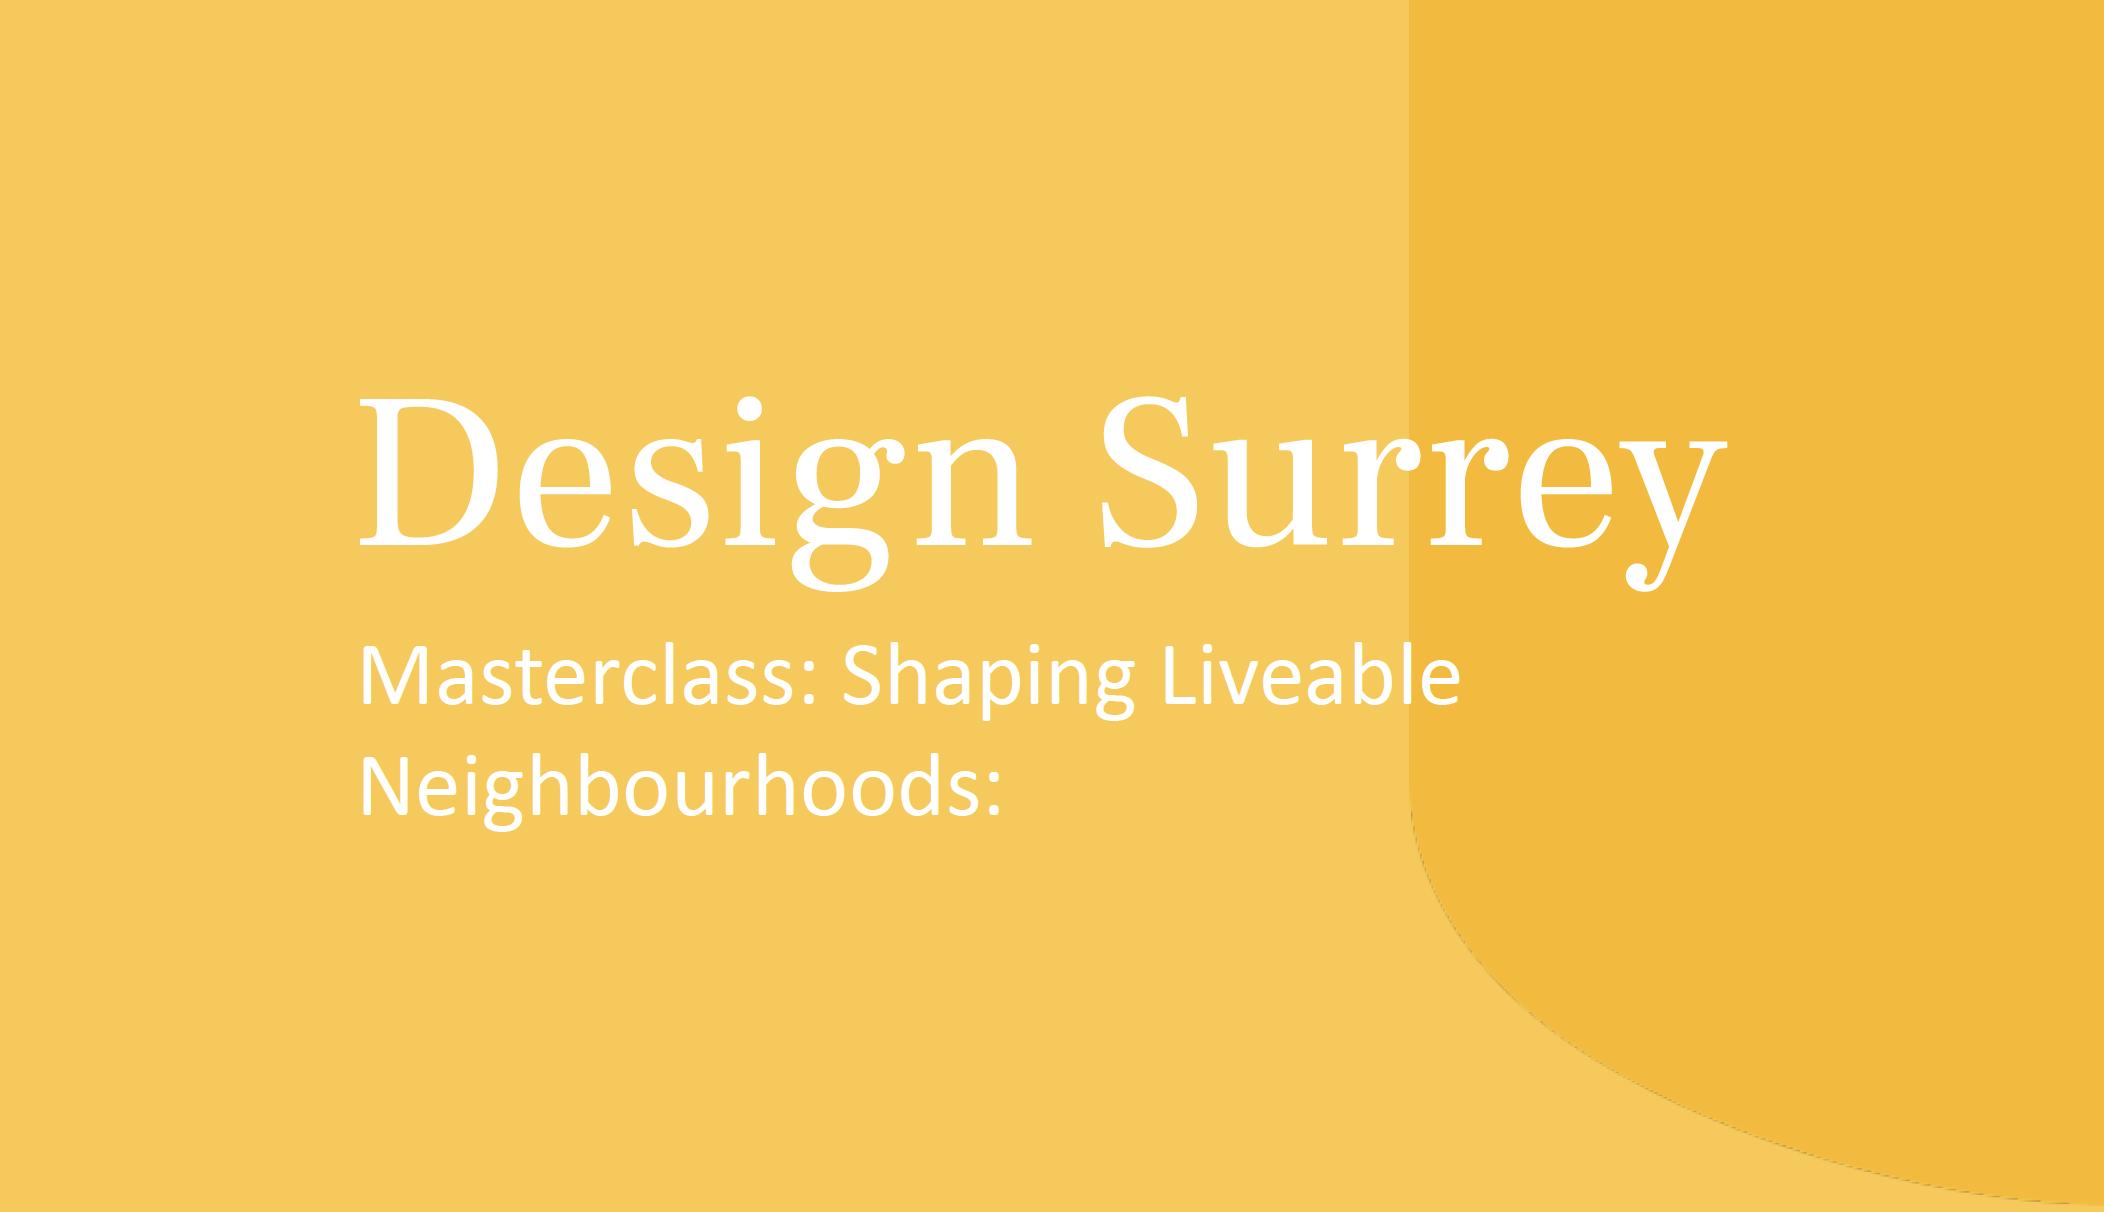 Design South East — Design Surrey: Masterclass: Shaping Liveable neighbourhoods: Delivering well-designed, higher density neighbourhoods